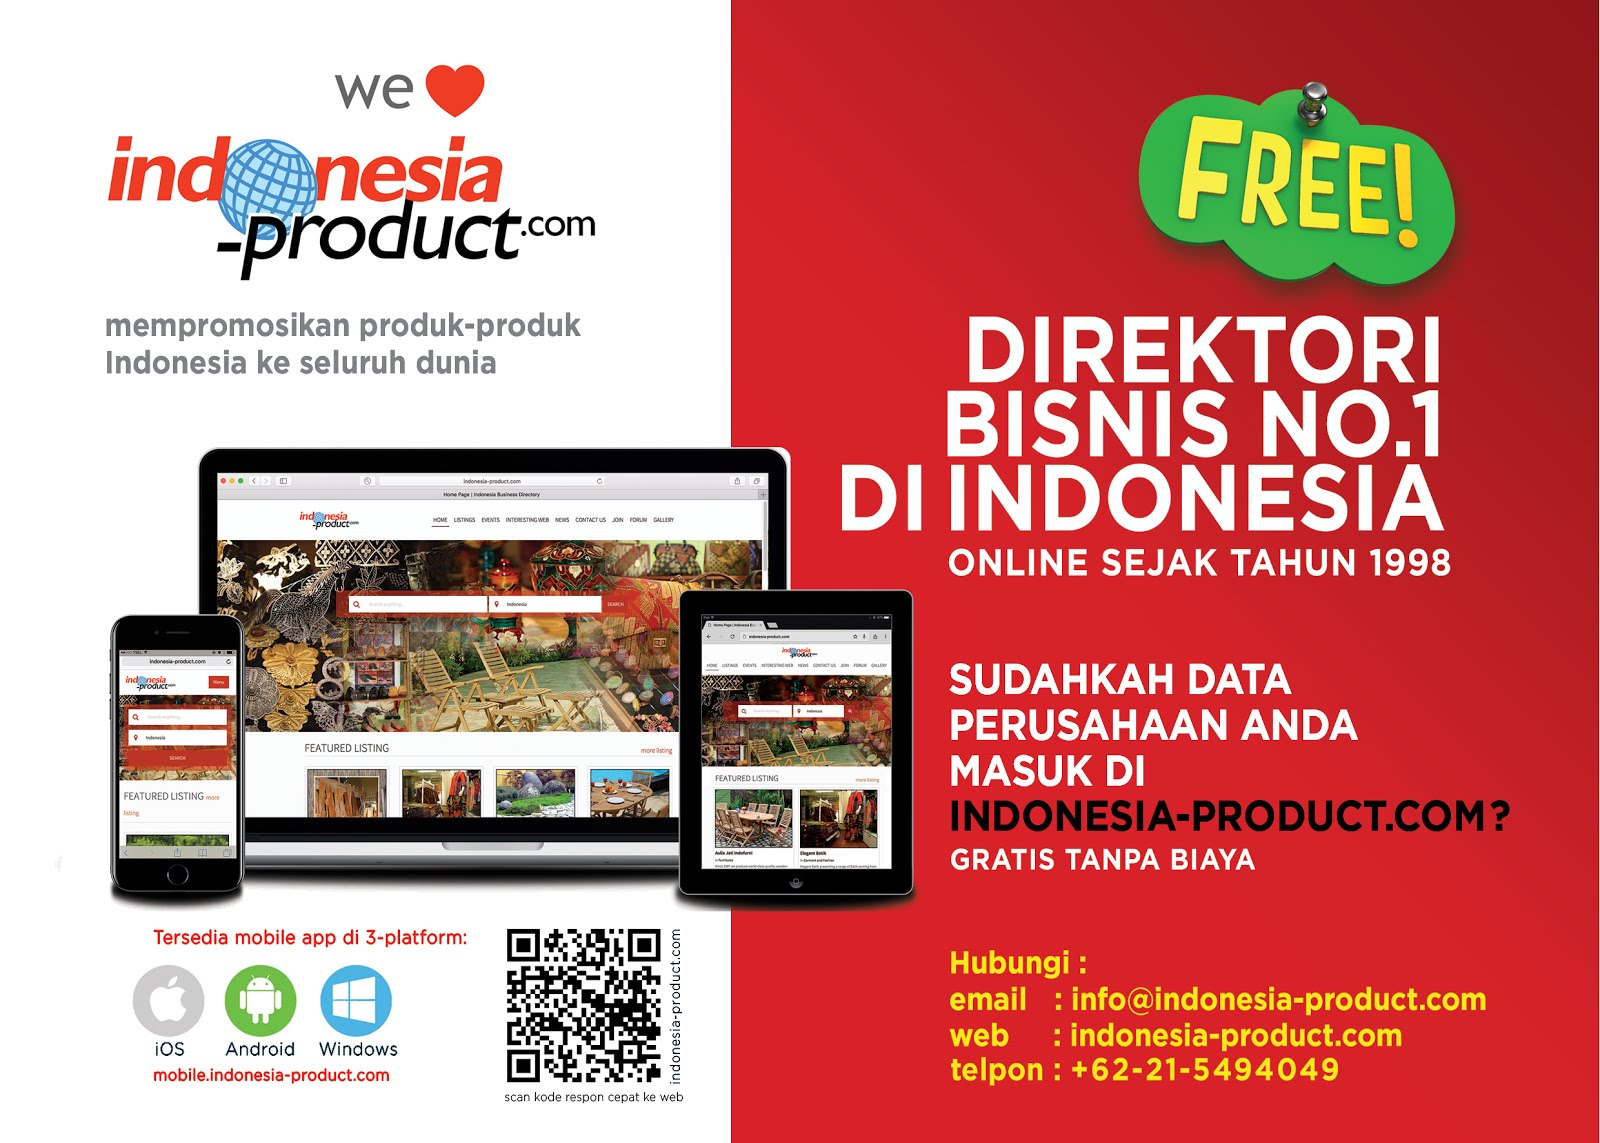 Macindo 2017 Produk Ukm Bumn Travel Bag Small Size Website Ini Dirancang Untuk Mengenalkan Indonesia Ke Seluruh Dunia Seperti Yang Kita Ketahui Batik Telah Menjadi Salah